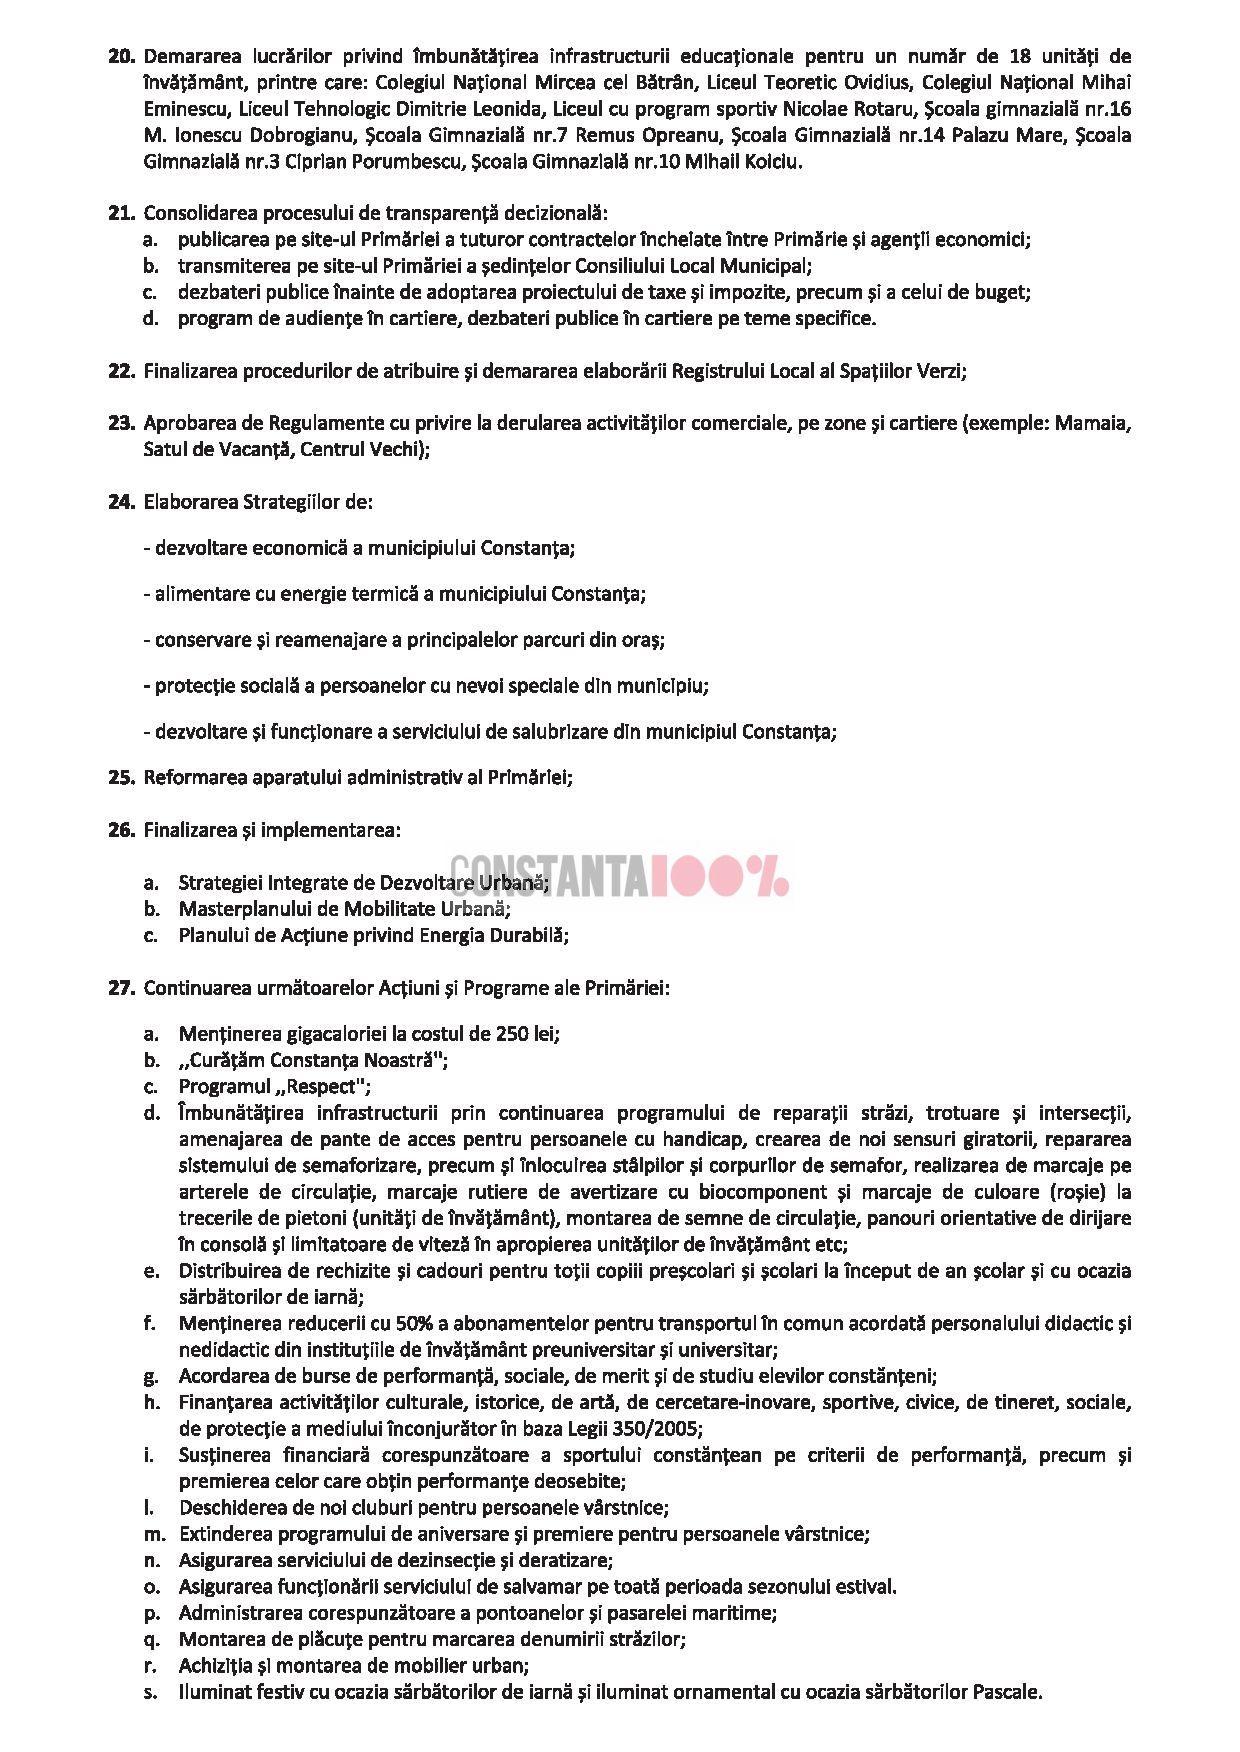 primaria constanta, obiective 2017 (1)